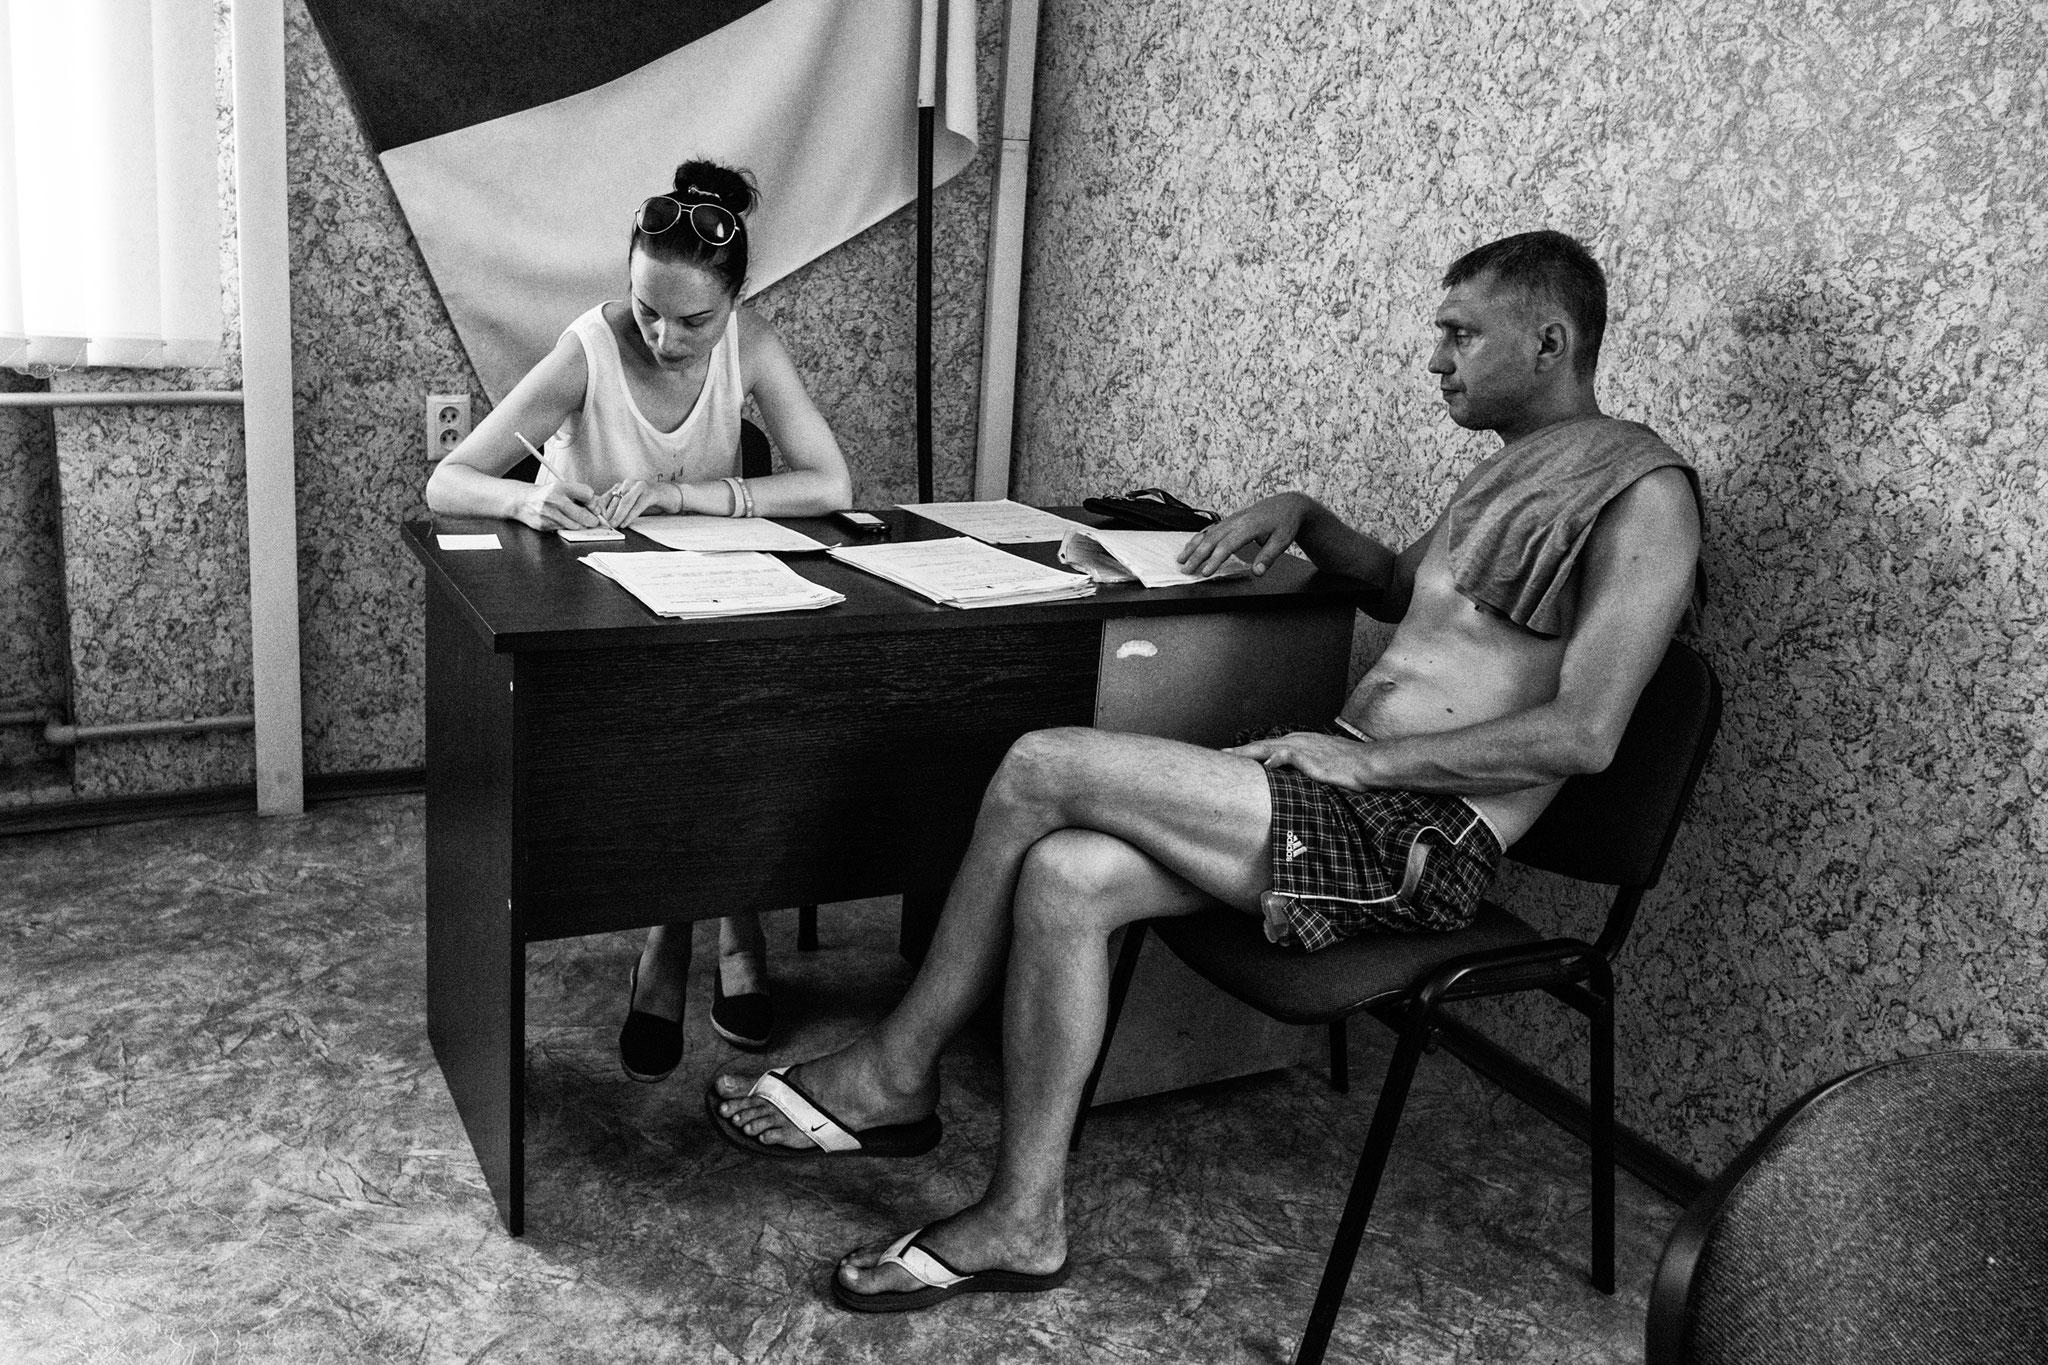 IDP Camp, Slovjansk, 2016